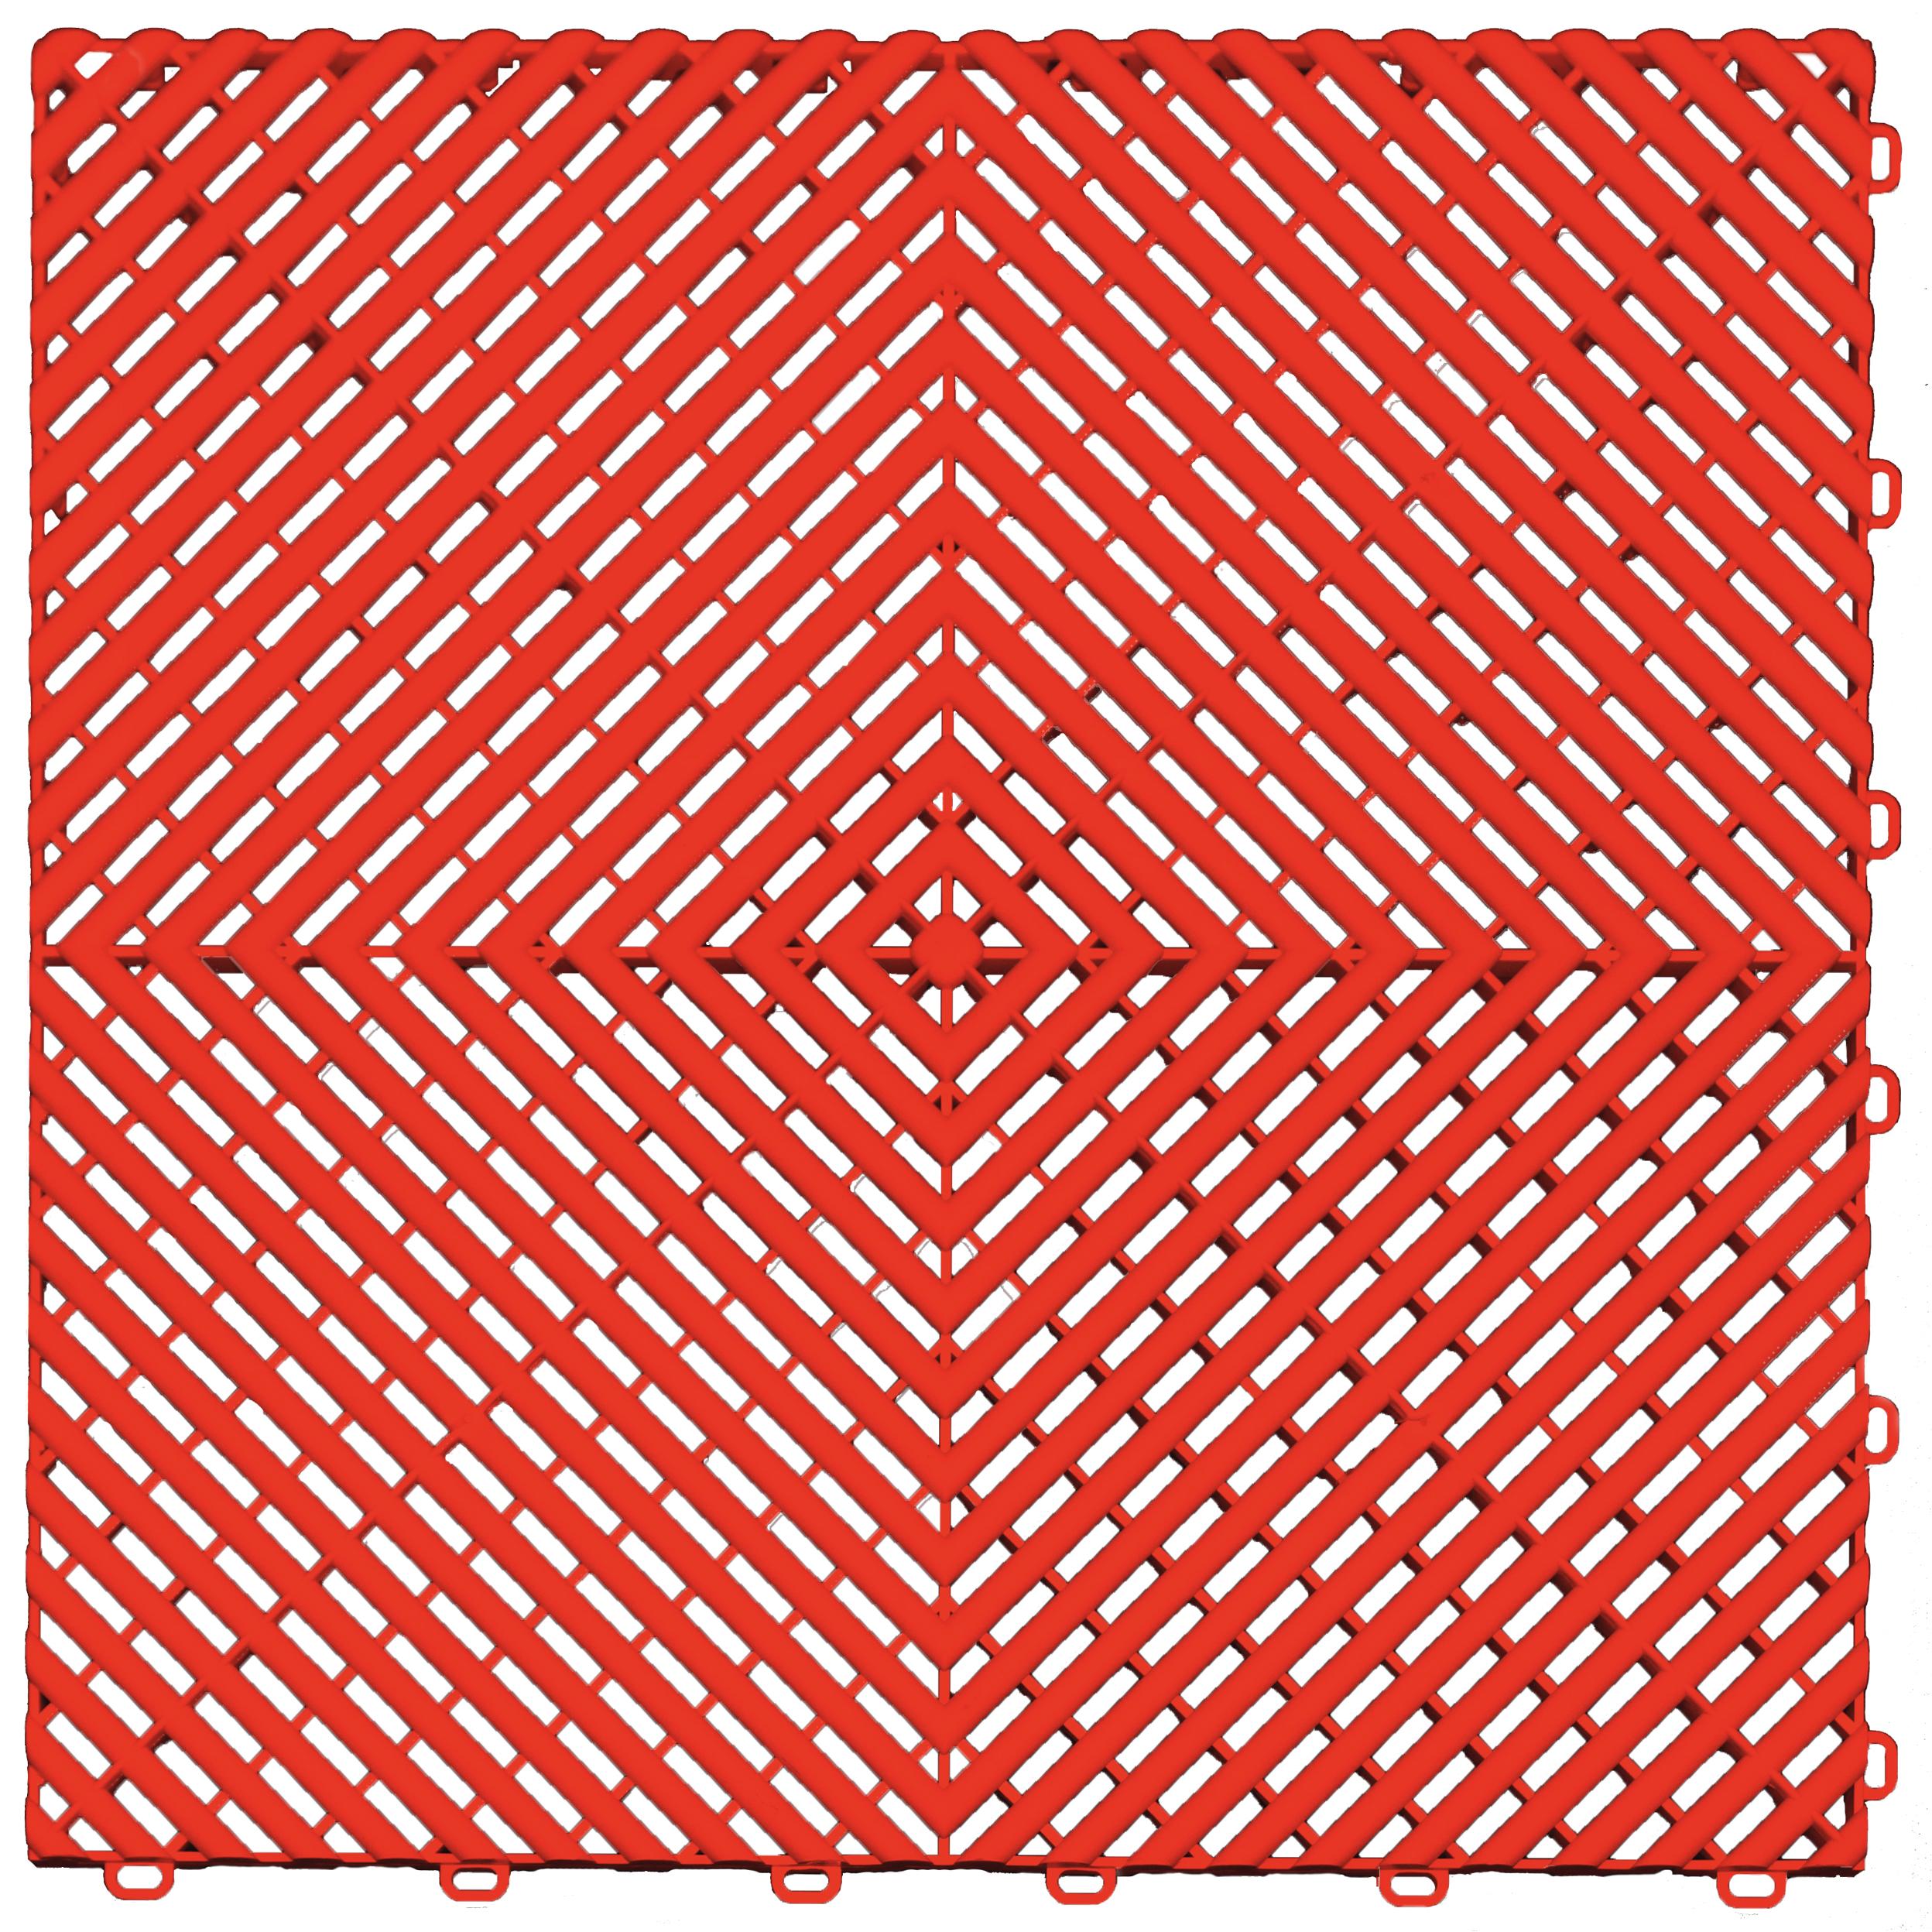 Swisstrax® Modular Tile